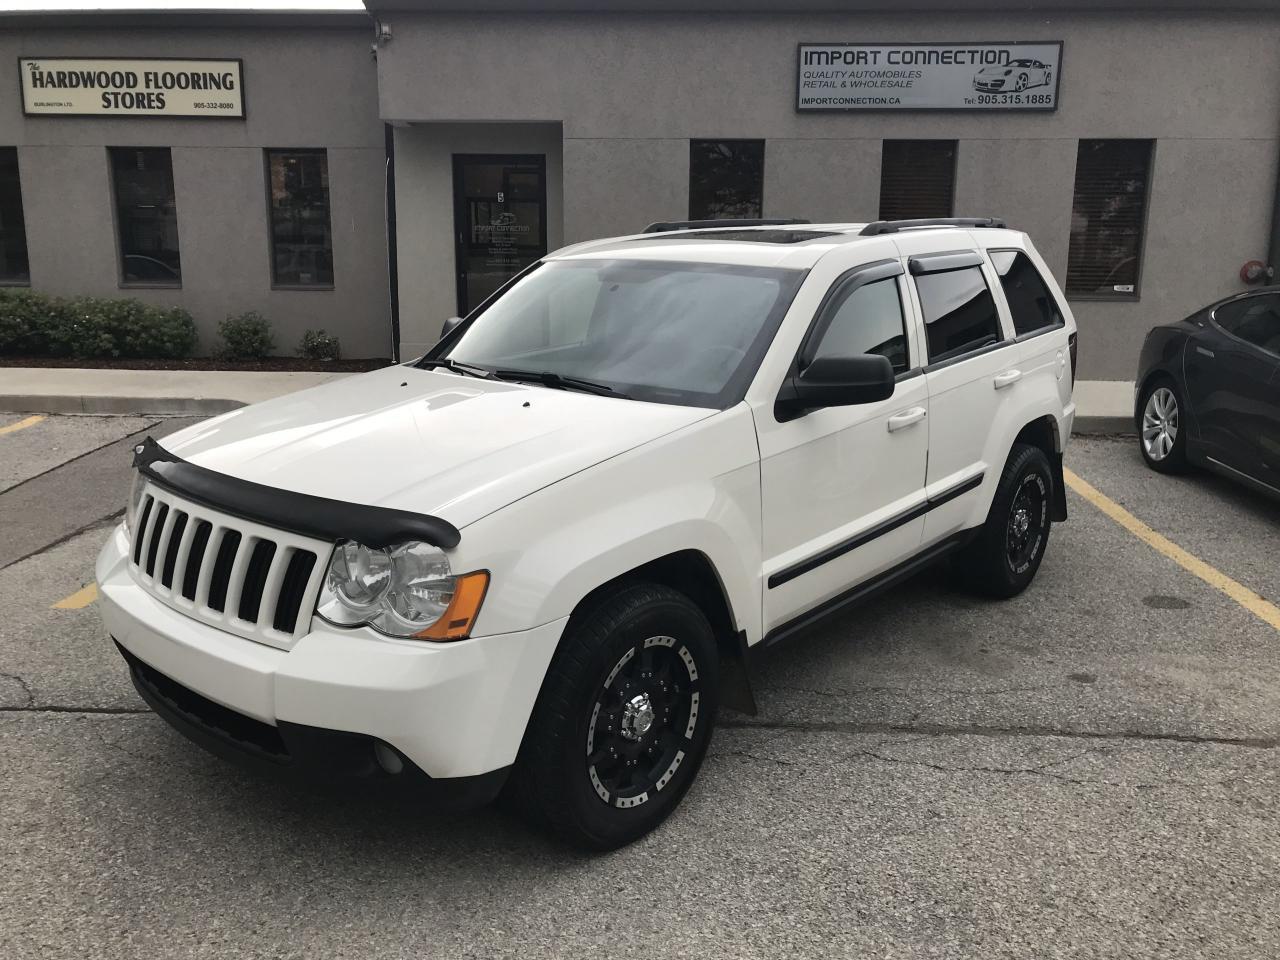 2008 Jeep Grand Cherokee Laredo,LEATHER,SUNROOF,CERTIFIED!